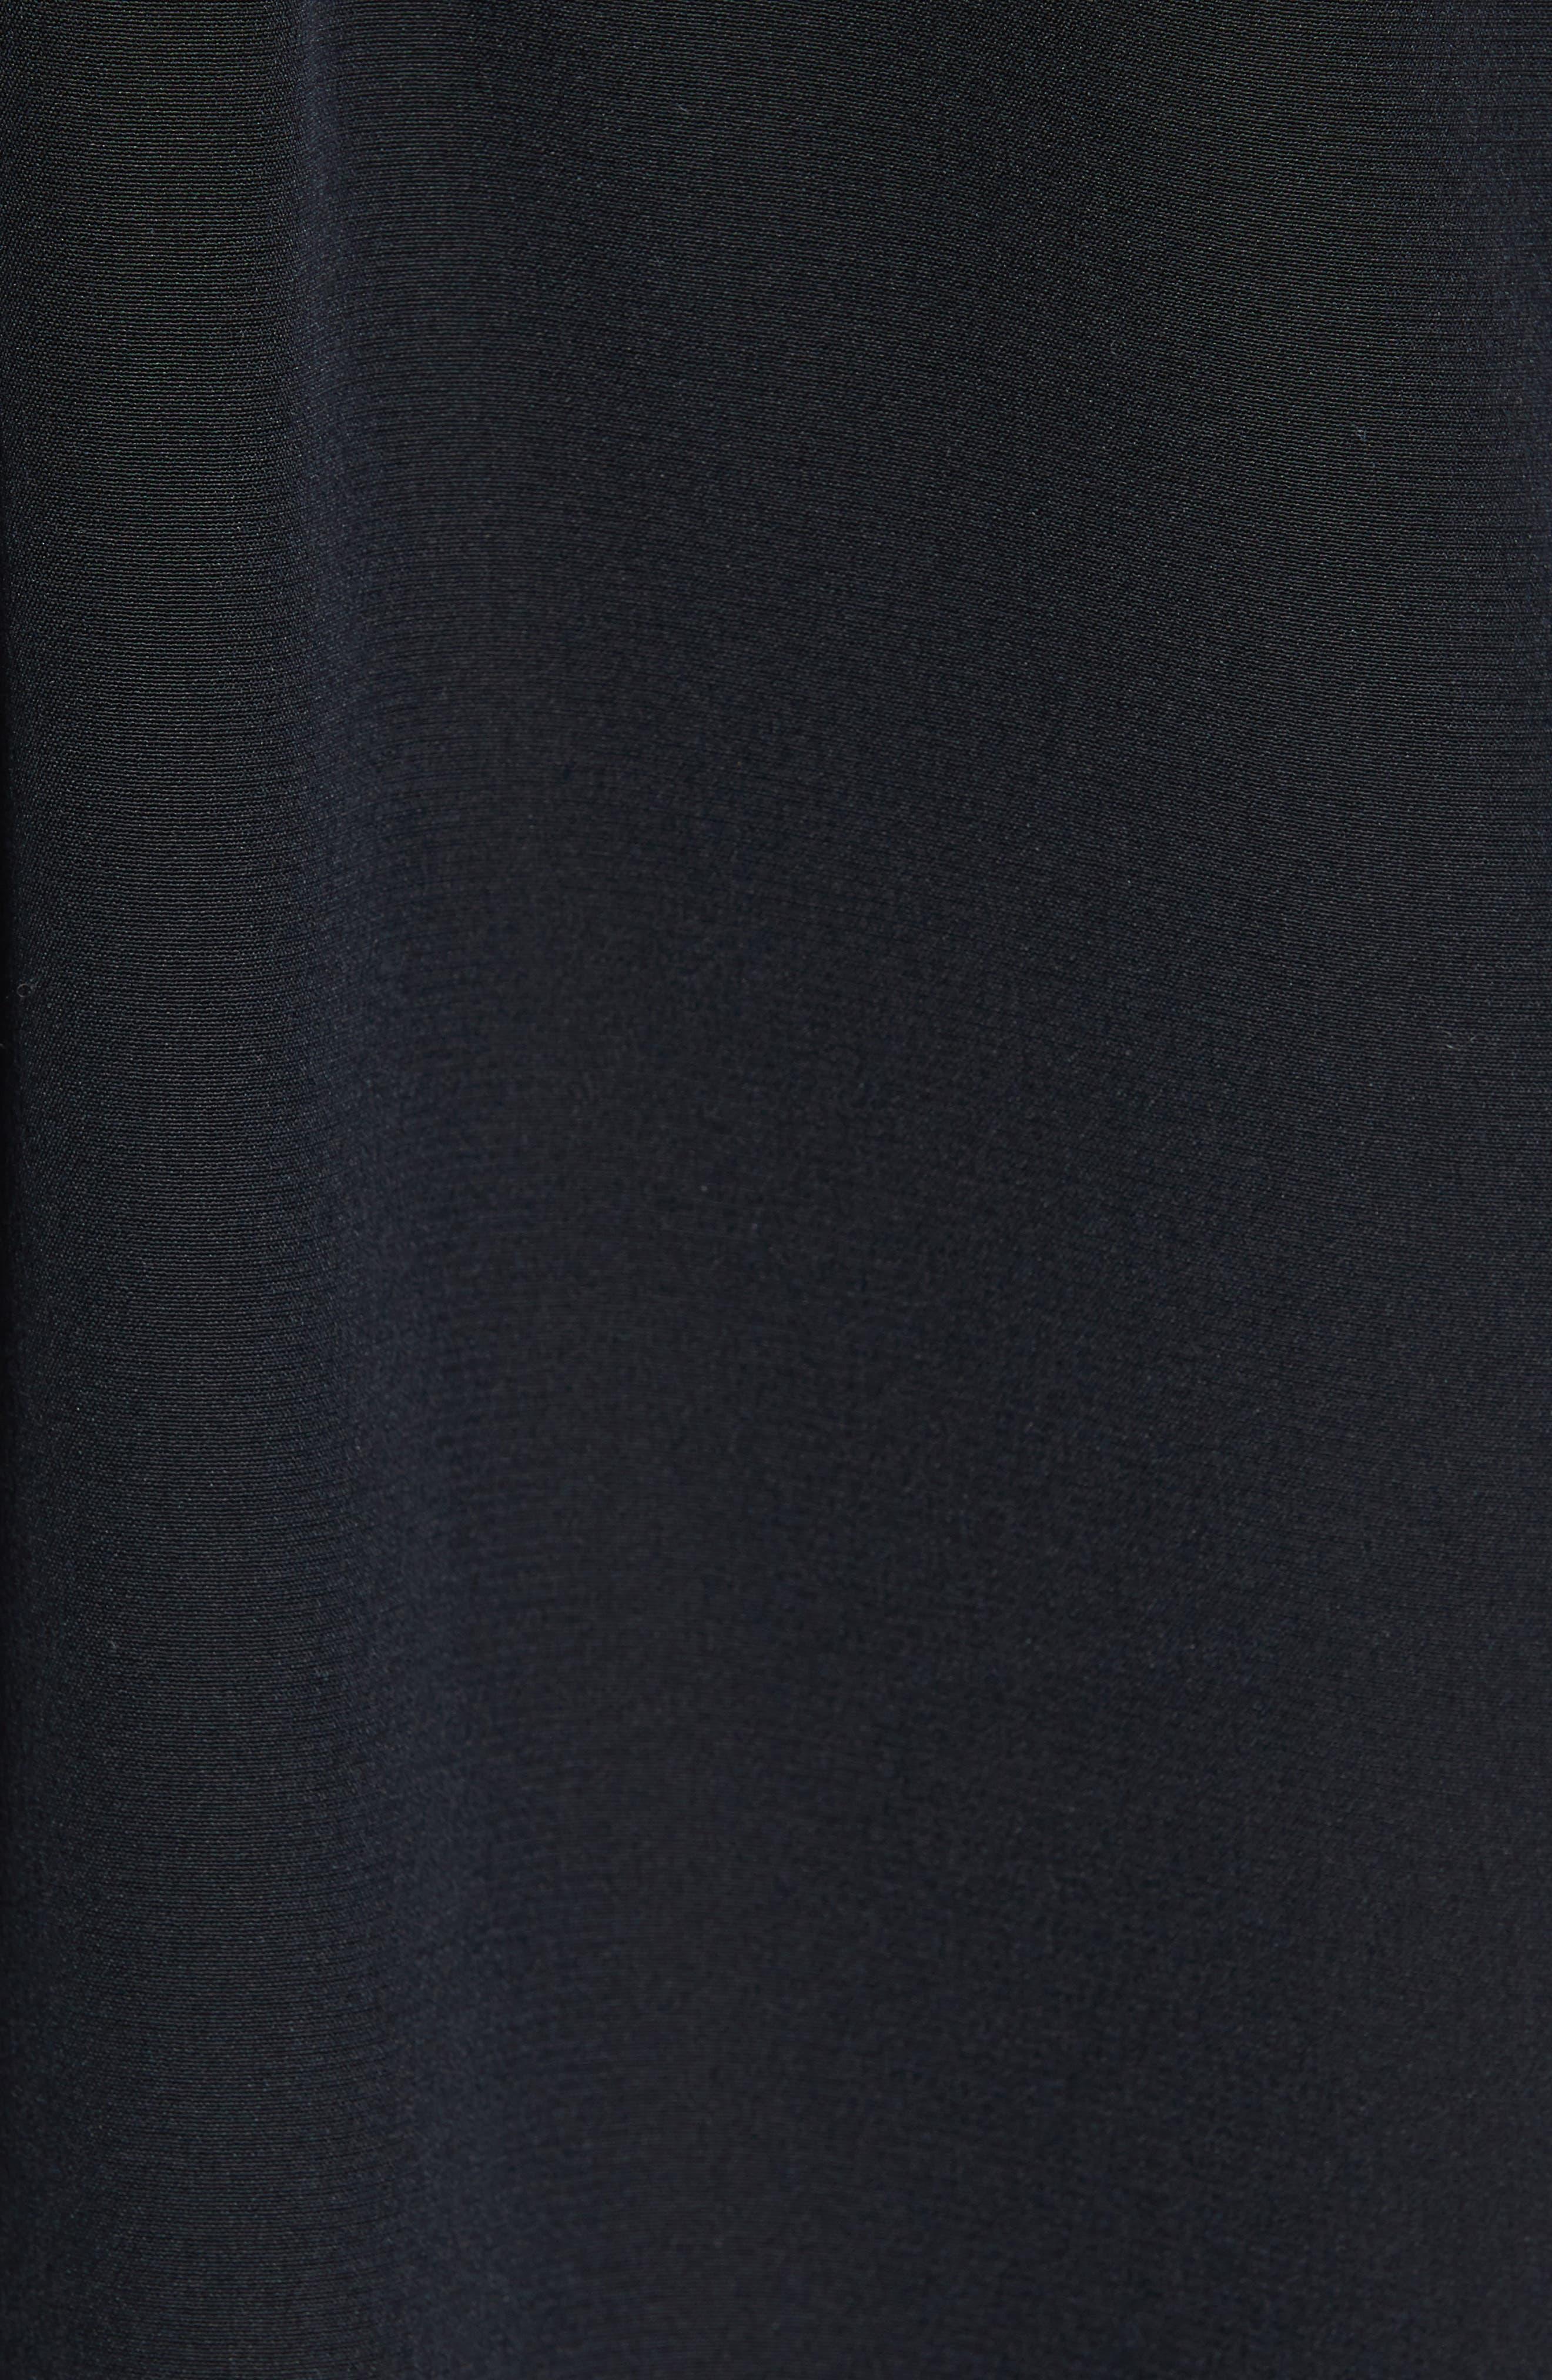 Silk Top,                             Alternate thumbnail 5, color,                             BLACK